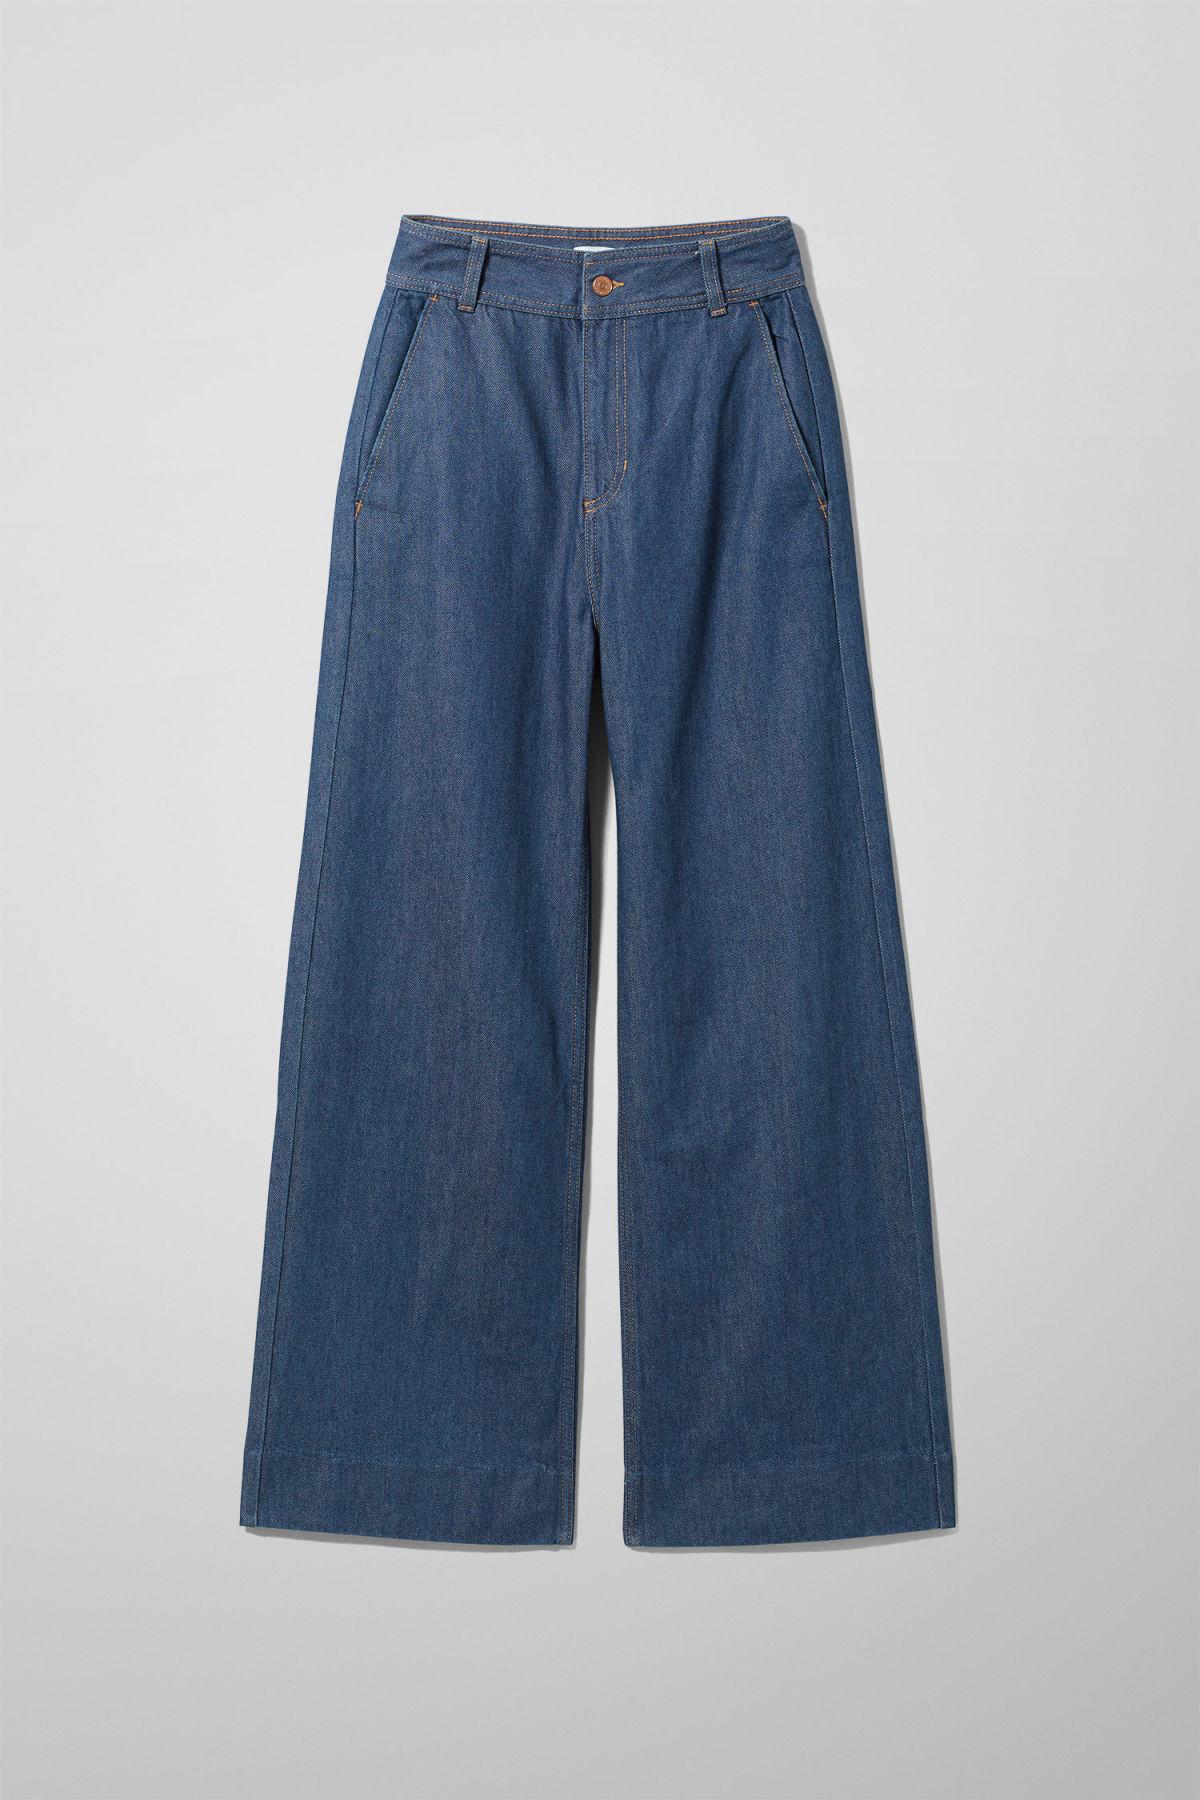 Cory Denim Trousers - Blue-38